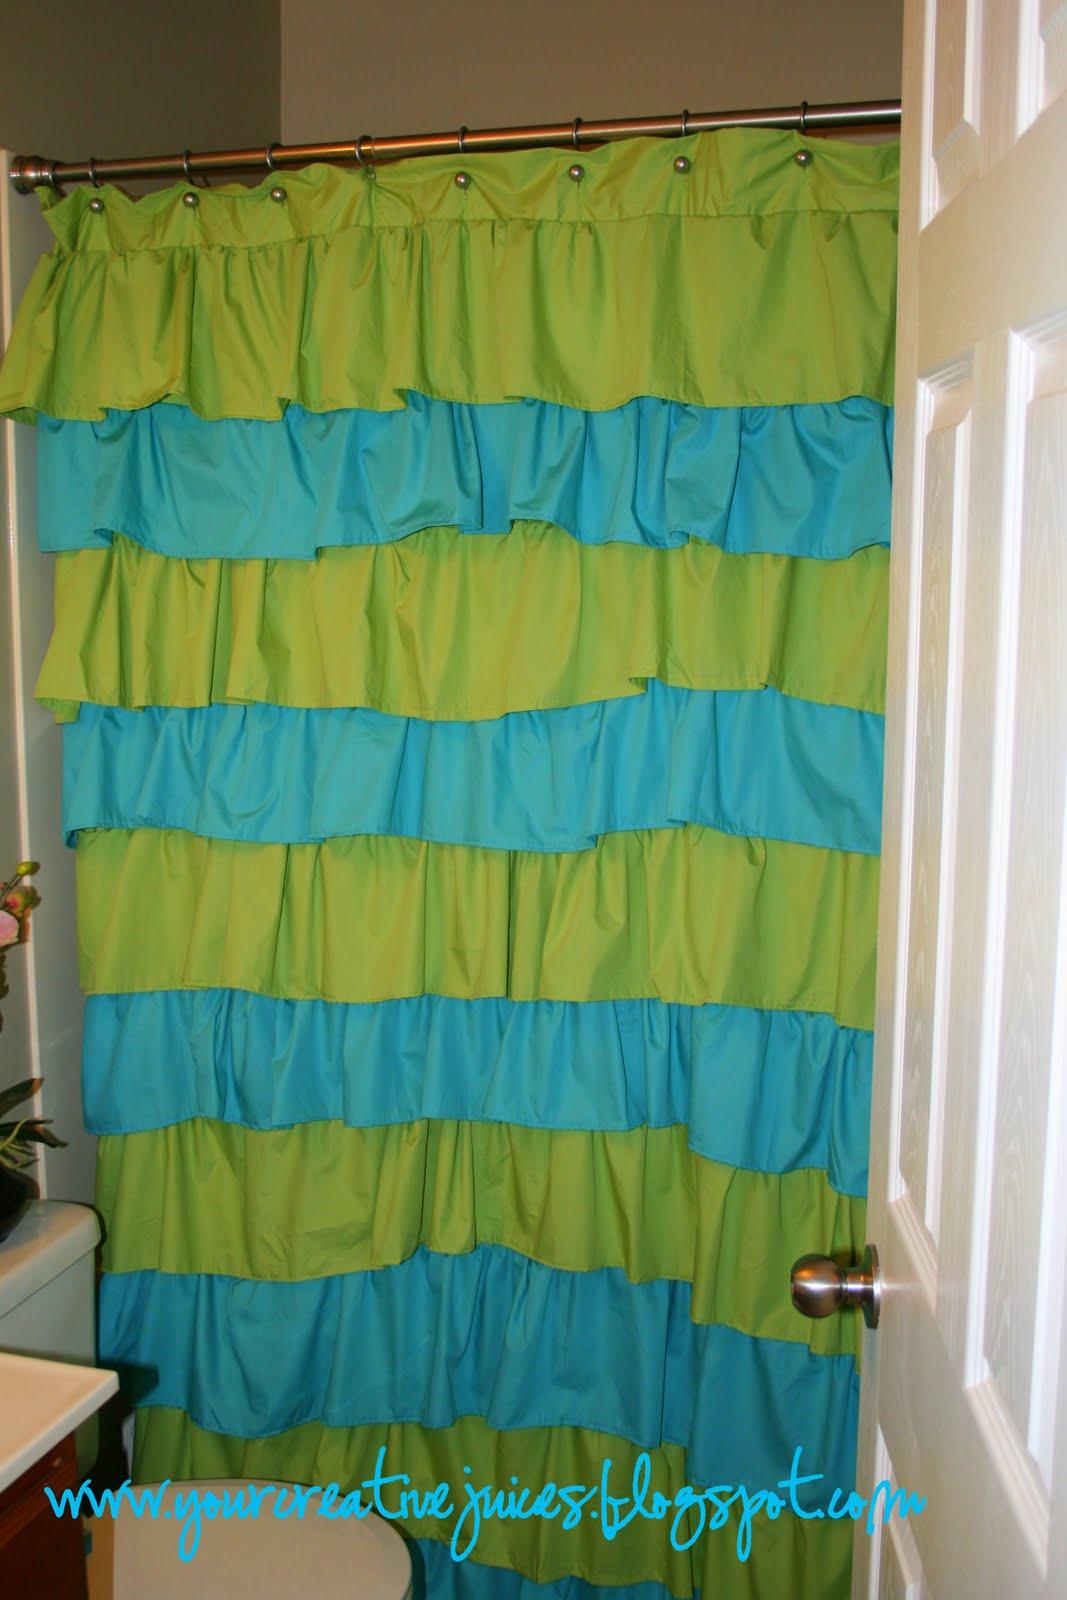 Creative Juices My 900 Ruffle Shower Curtain